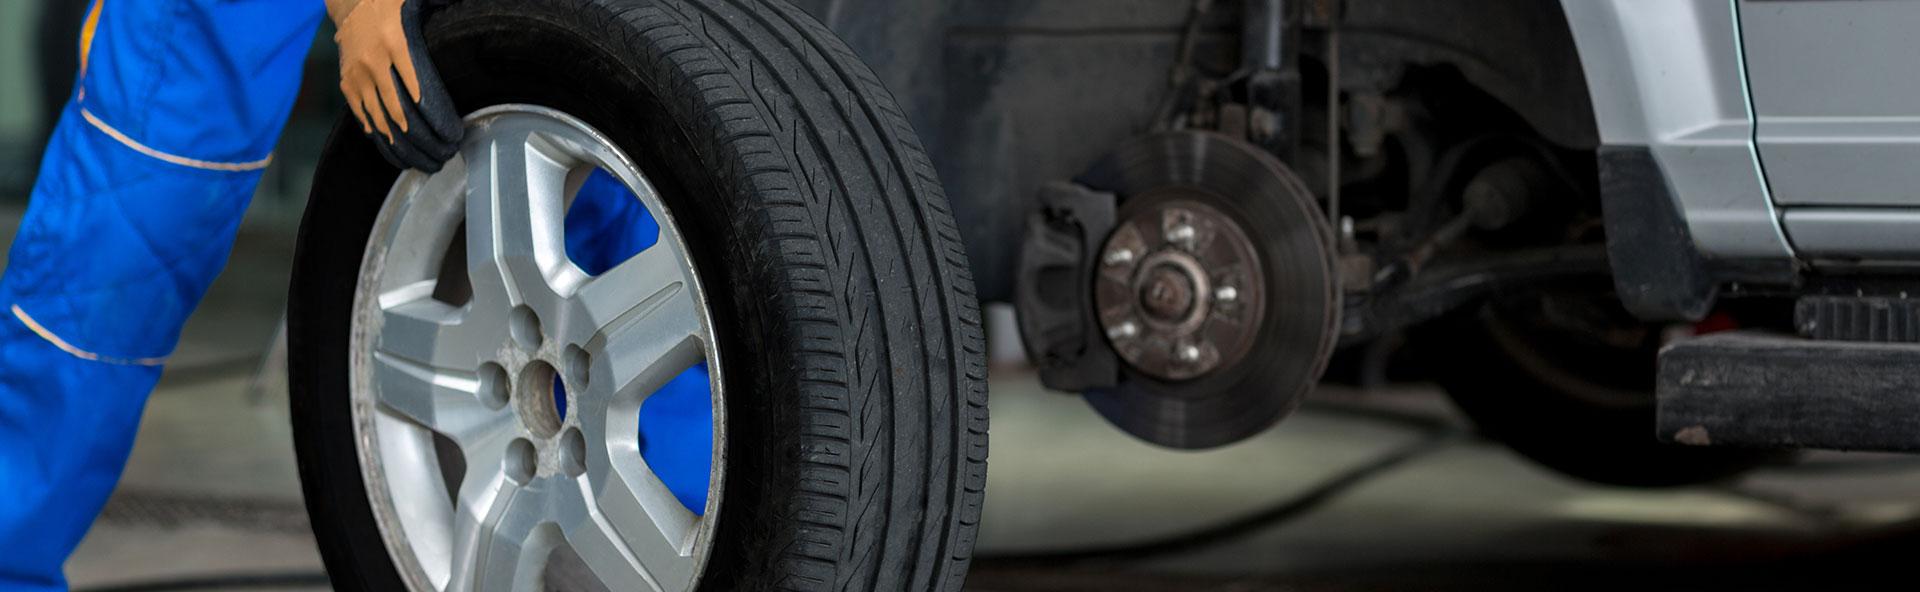 Balbriggan Service Centre - Tyres & Wheels